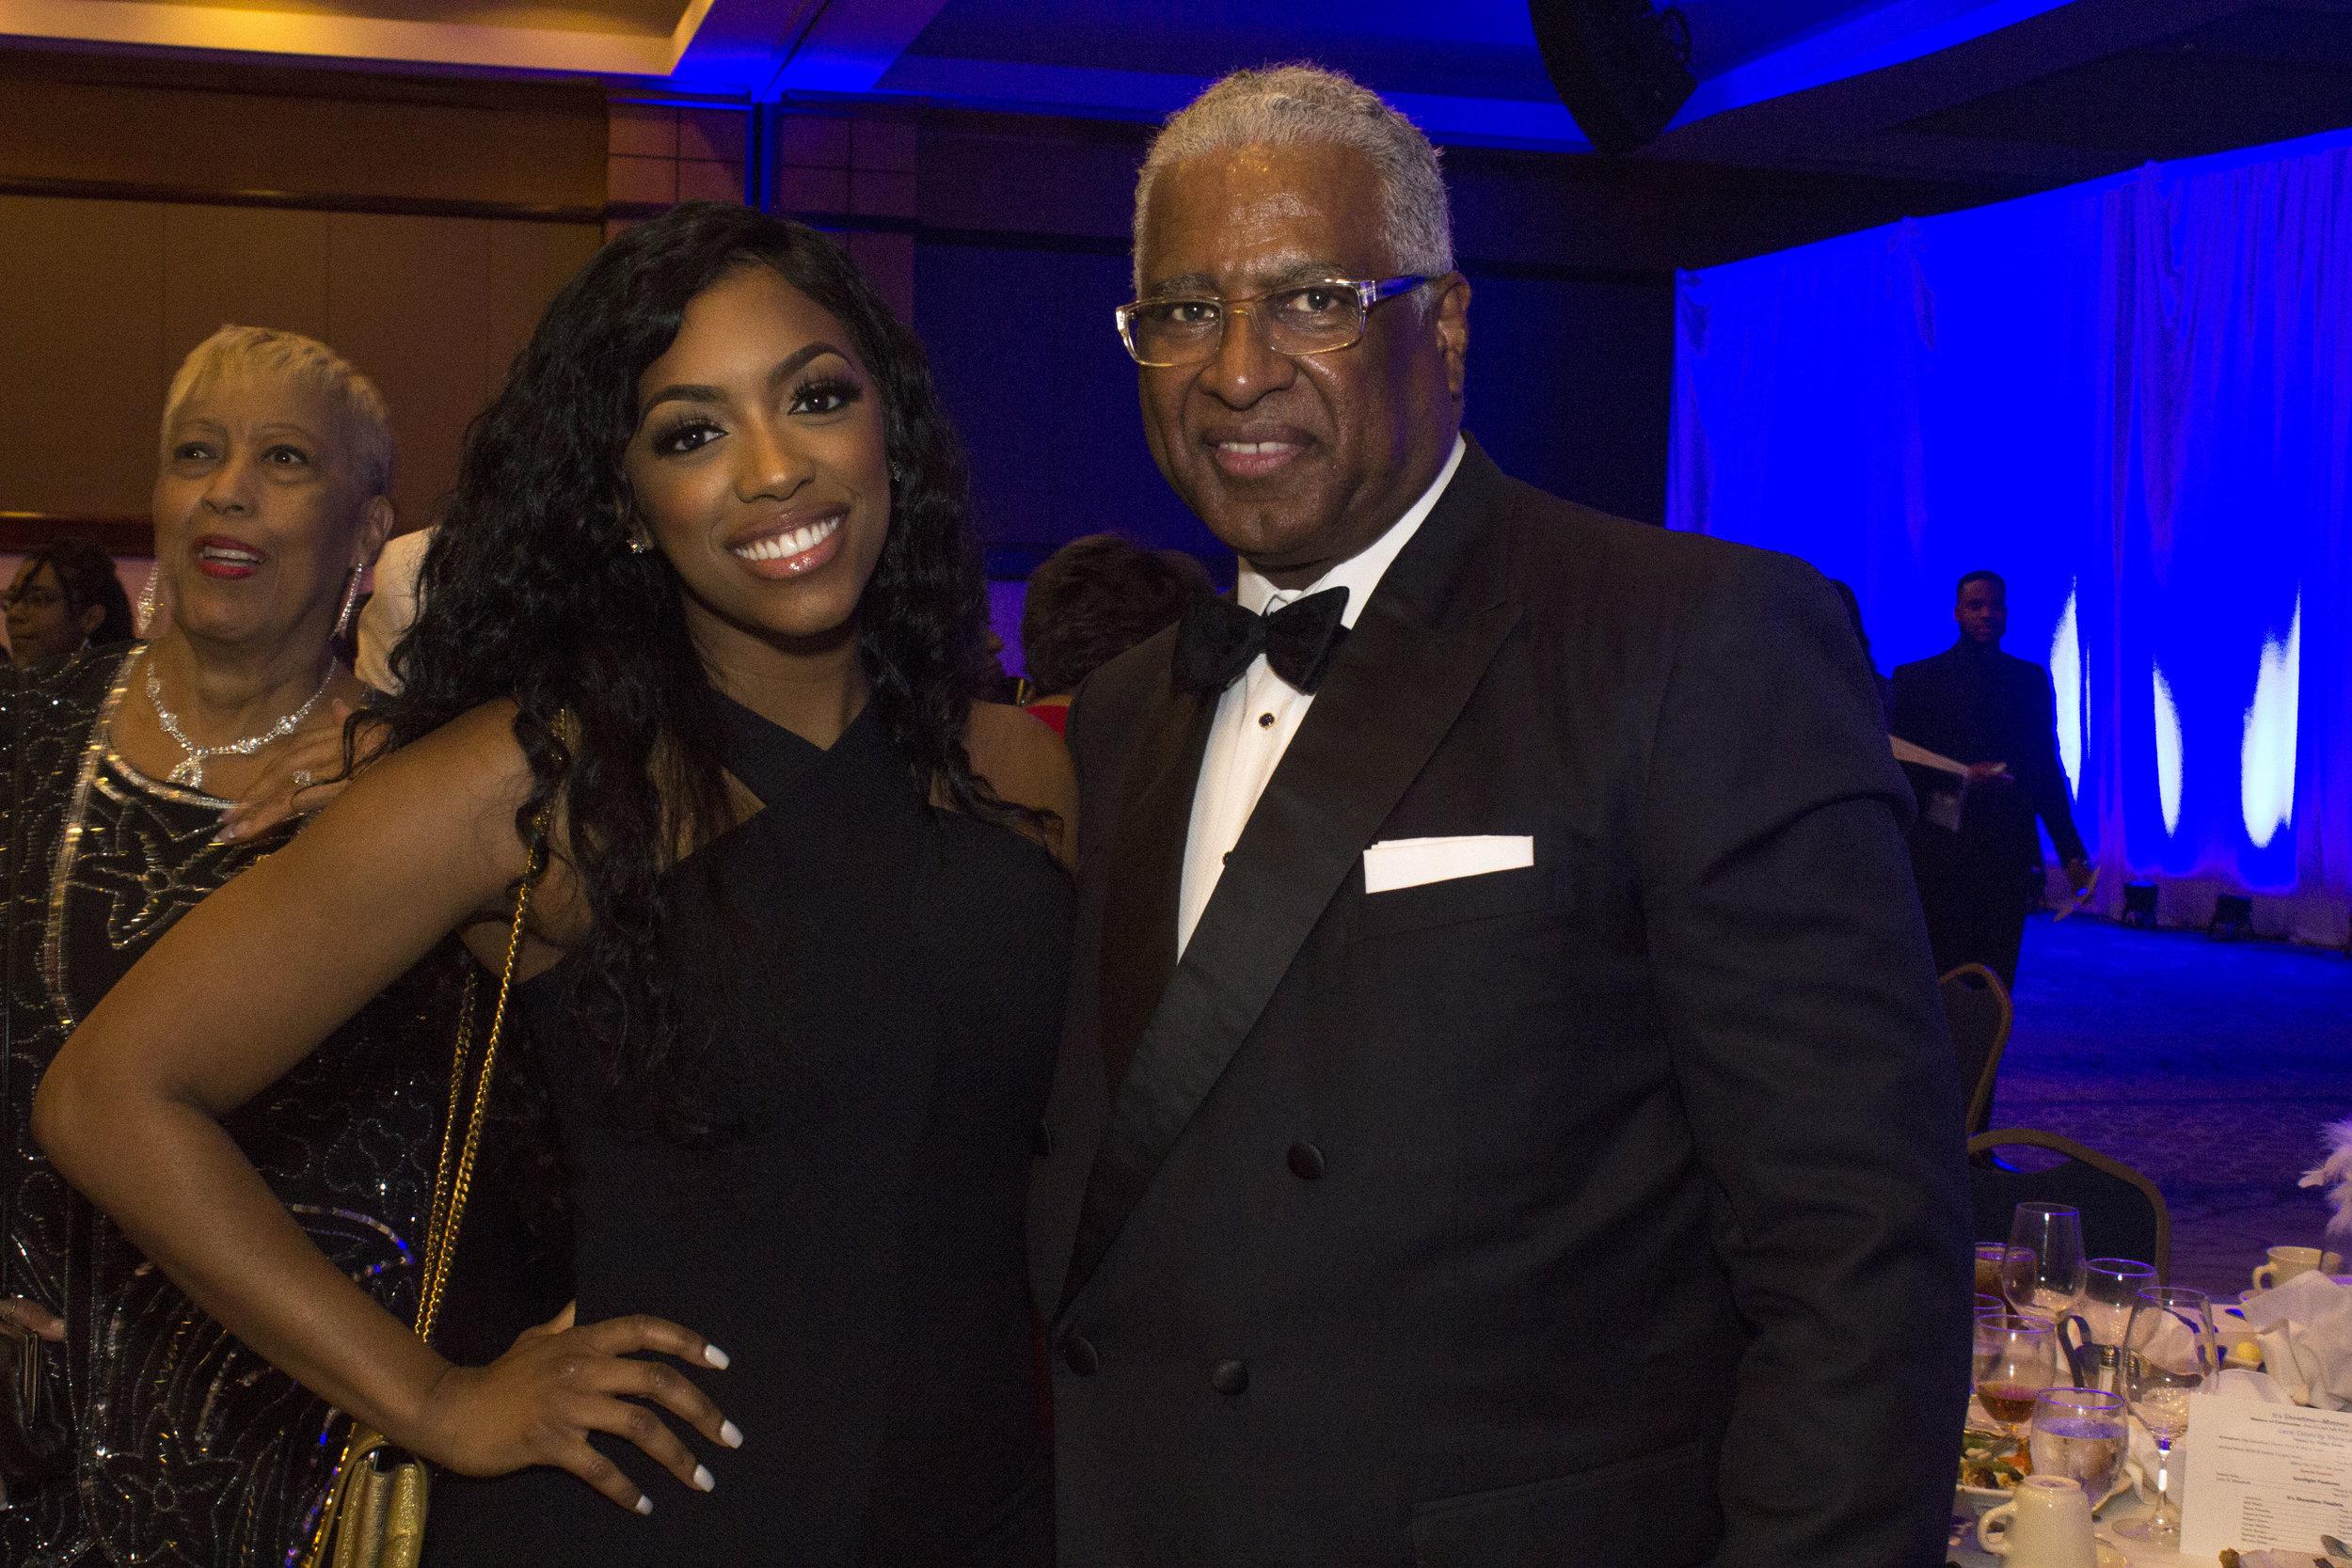 Porsha Williams of Atlanta housewives and Birmingham Mayor William Bell.